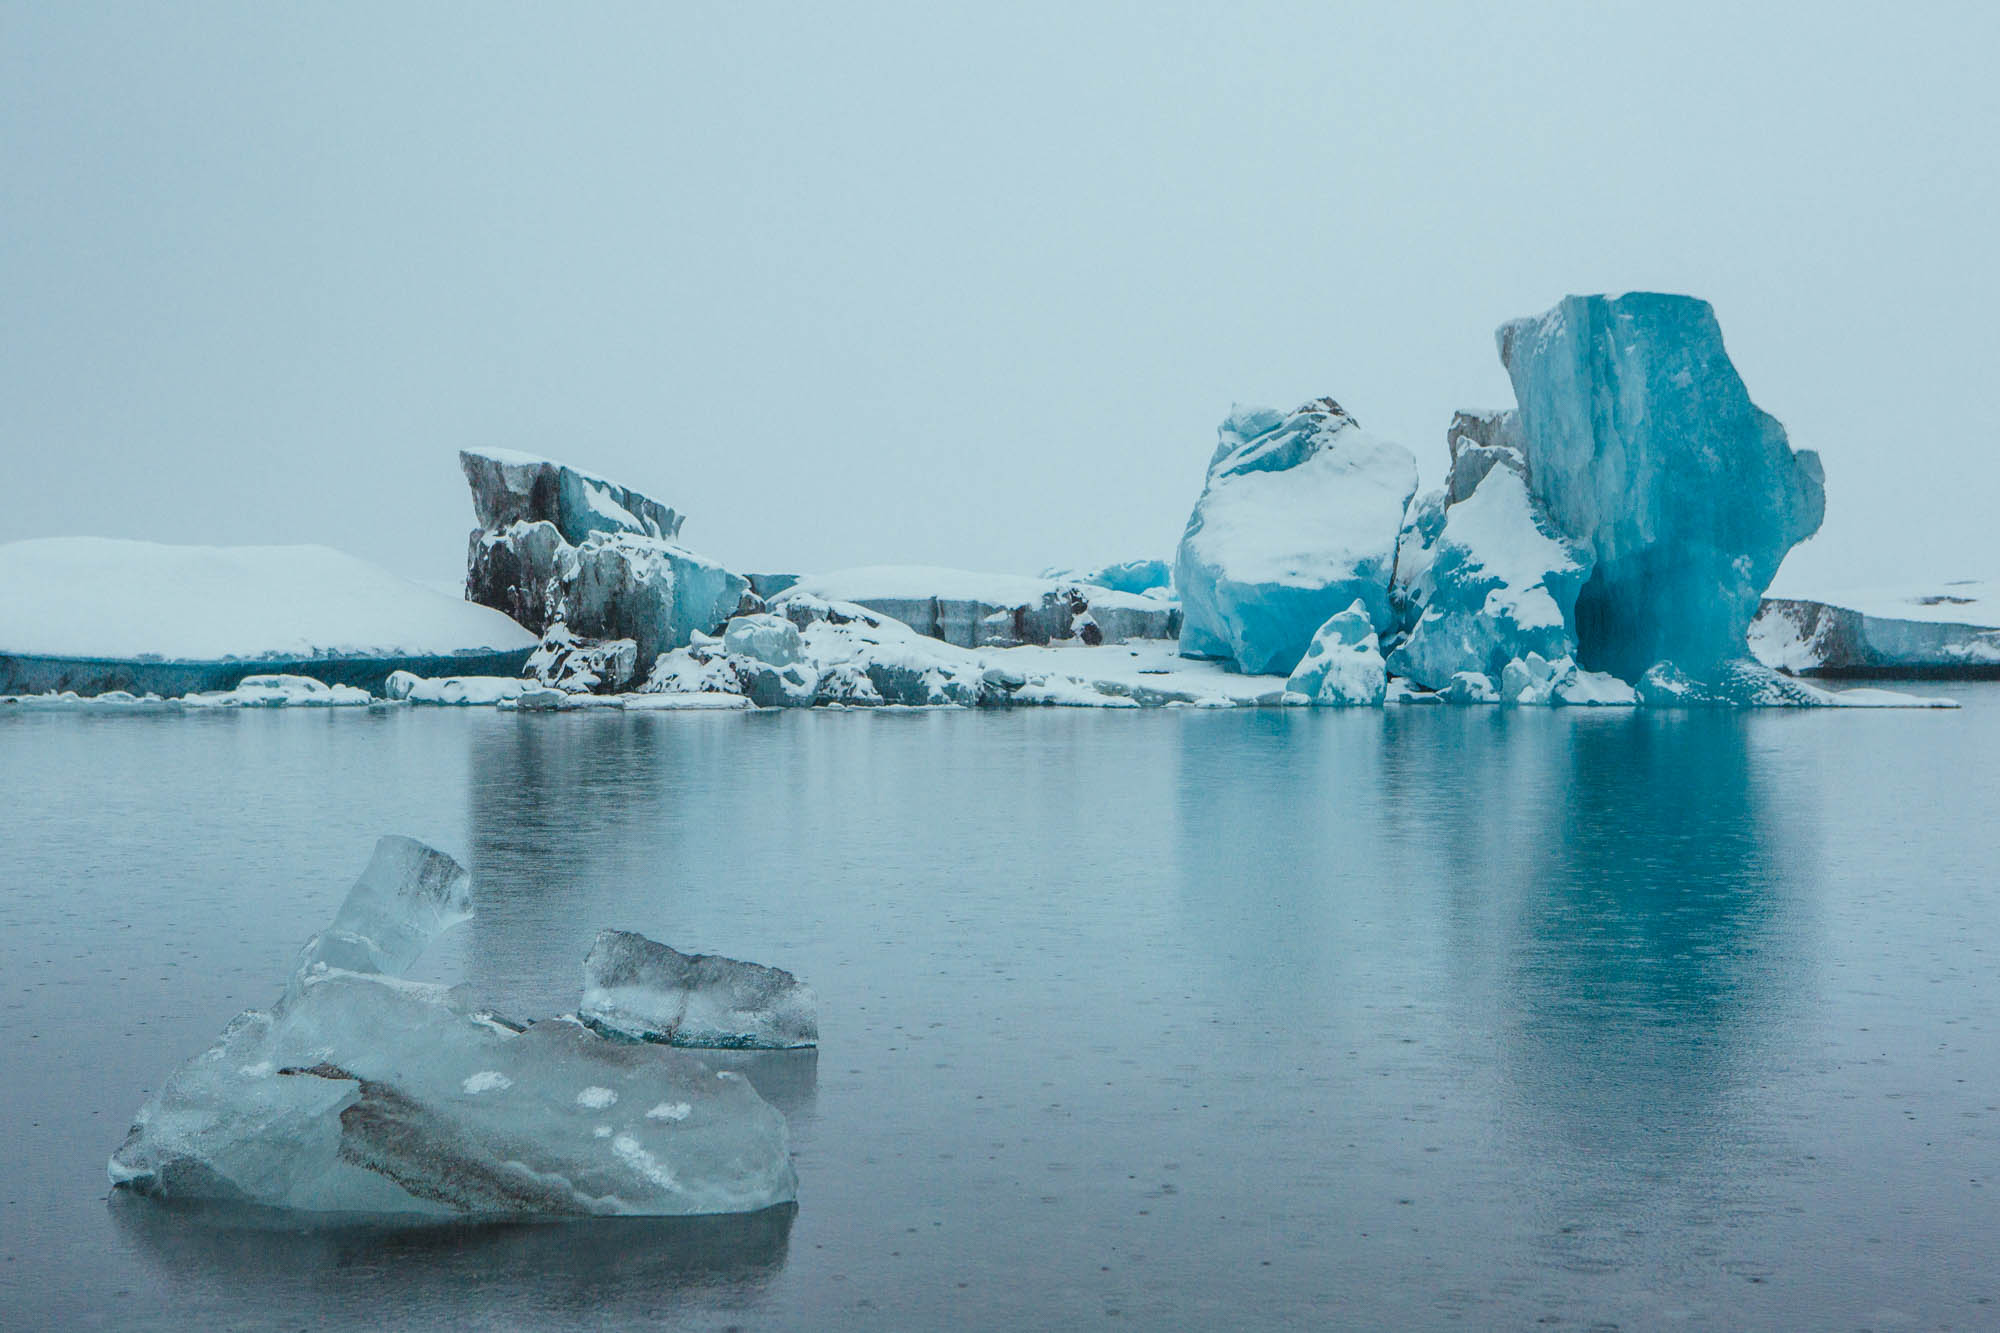 Iceland photo inspiration – Jokulsarlon glacier lagoon